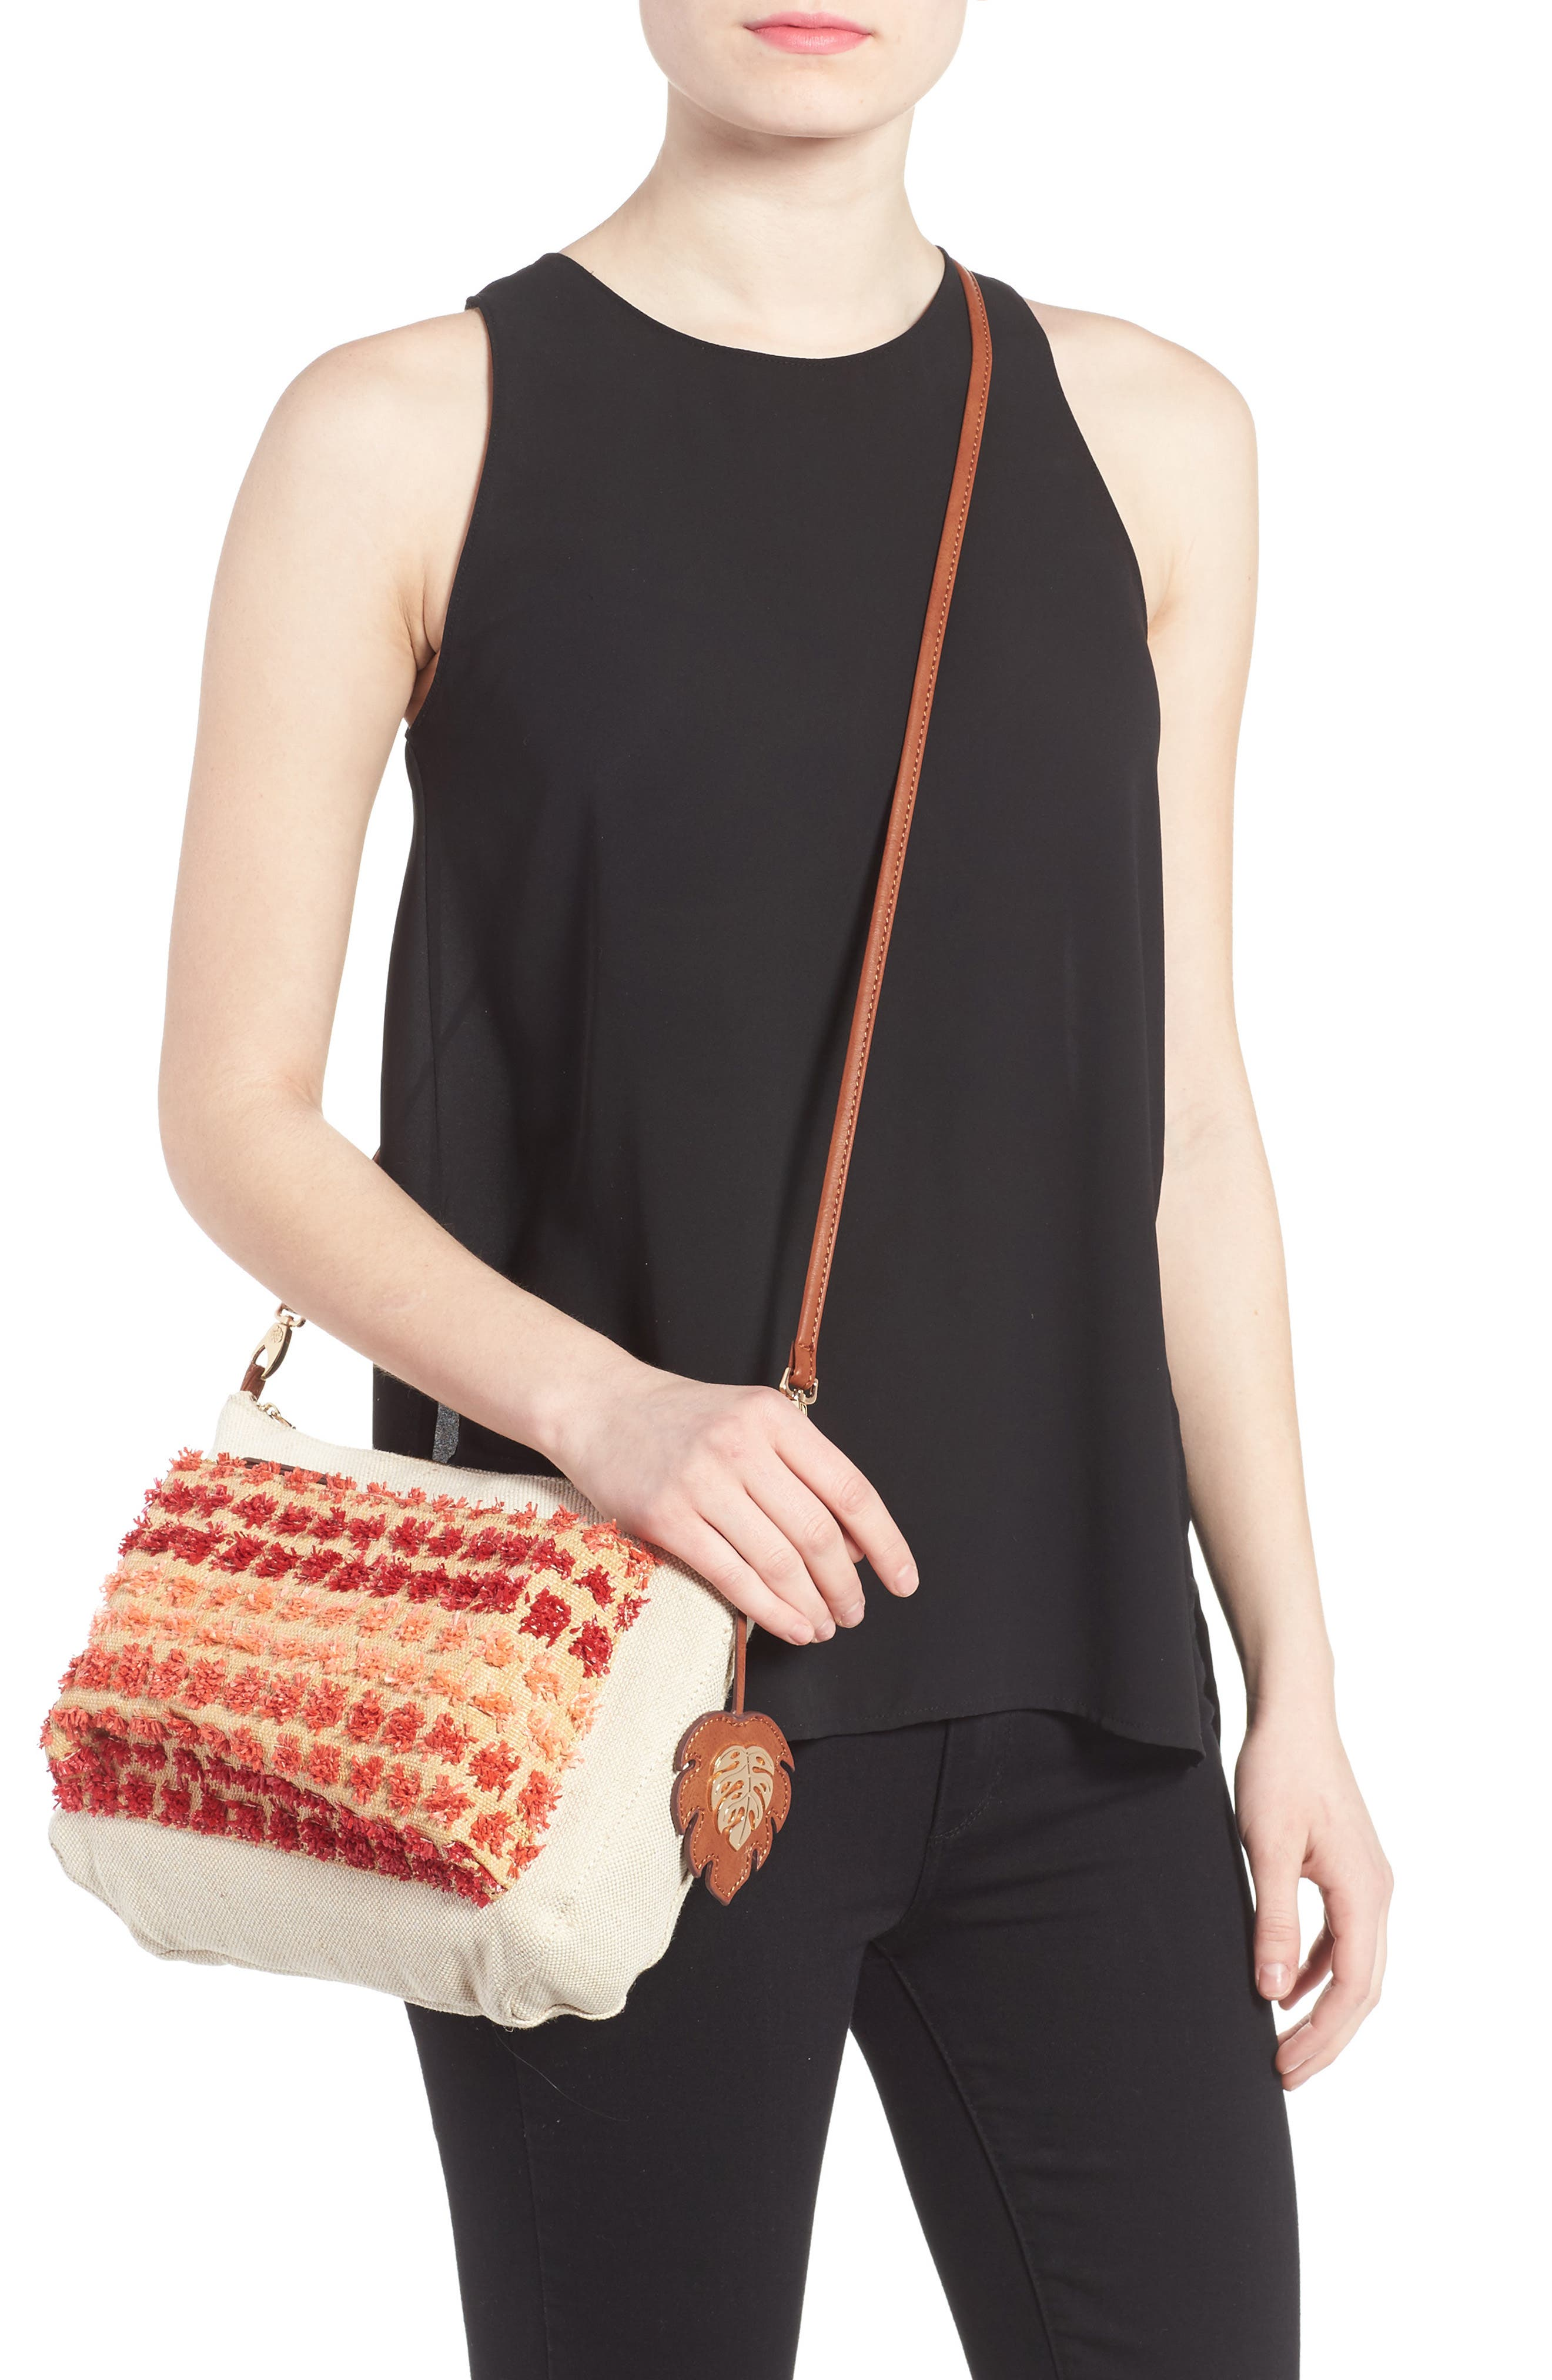 Koki Beach Crossbody Bag,                             Alternate thumbnail 3, color,                             250